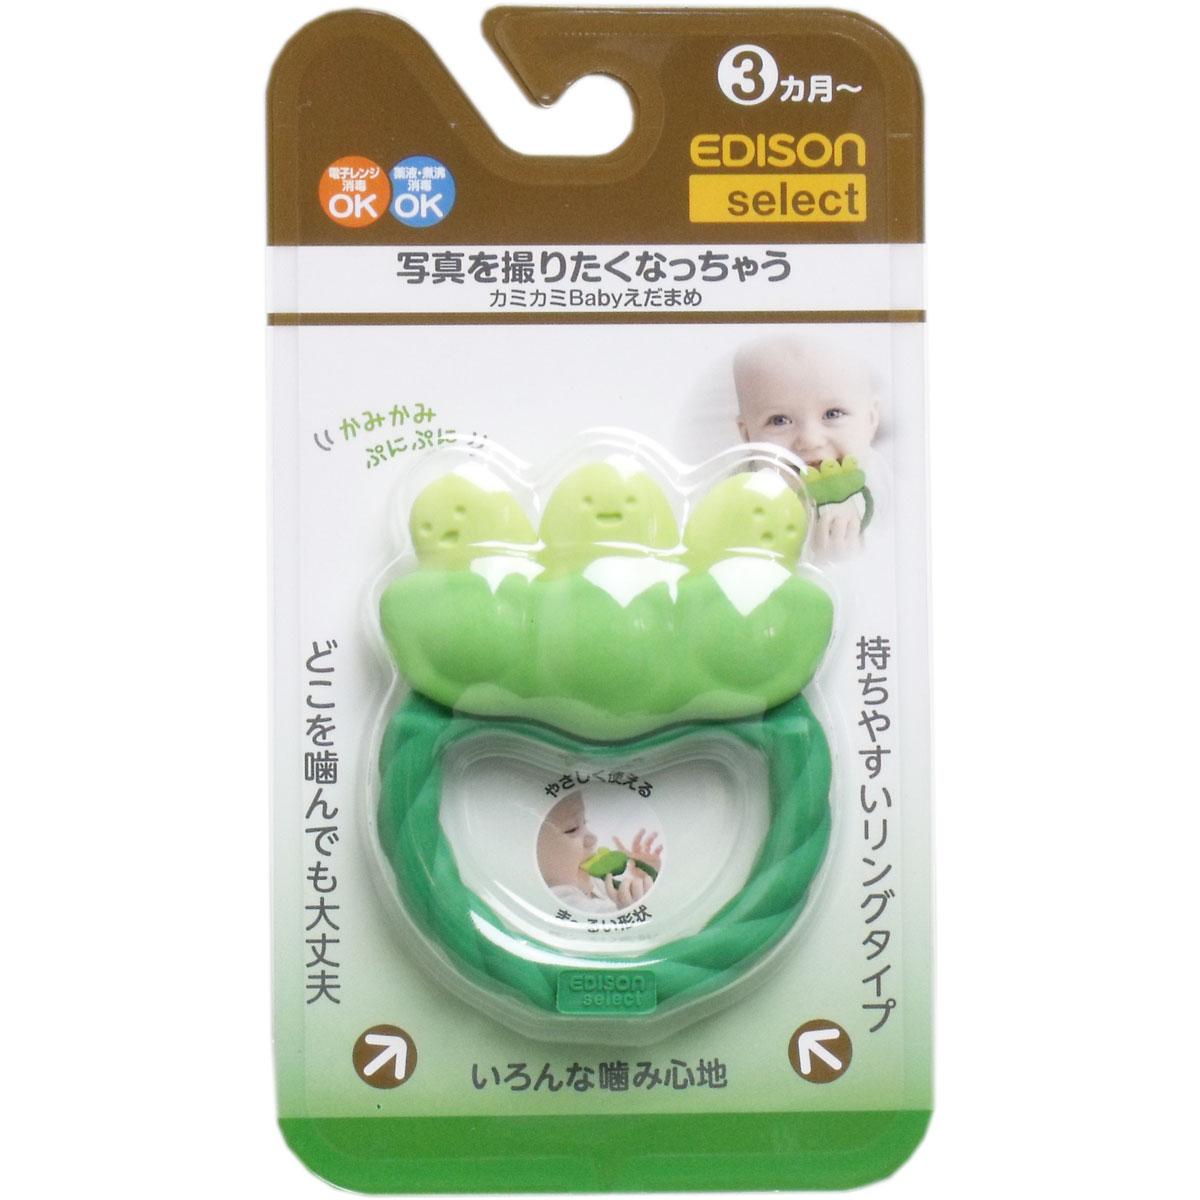 Edison 毛豆造型嬰幼兒固齒器 磨牙玩具 咬牙固齒玩具 3個月以上適用 *夏日微風*